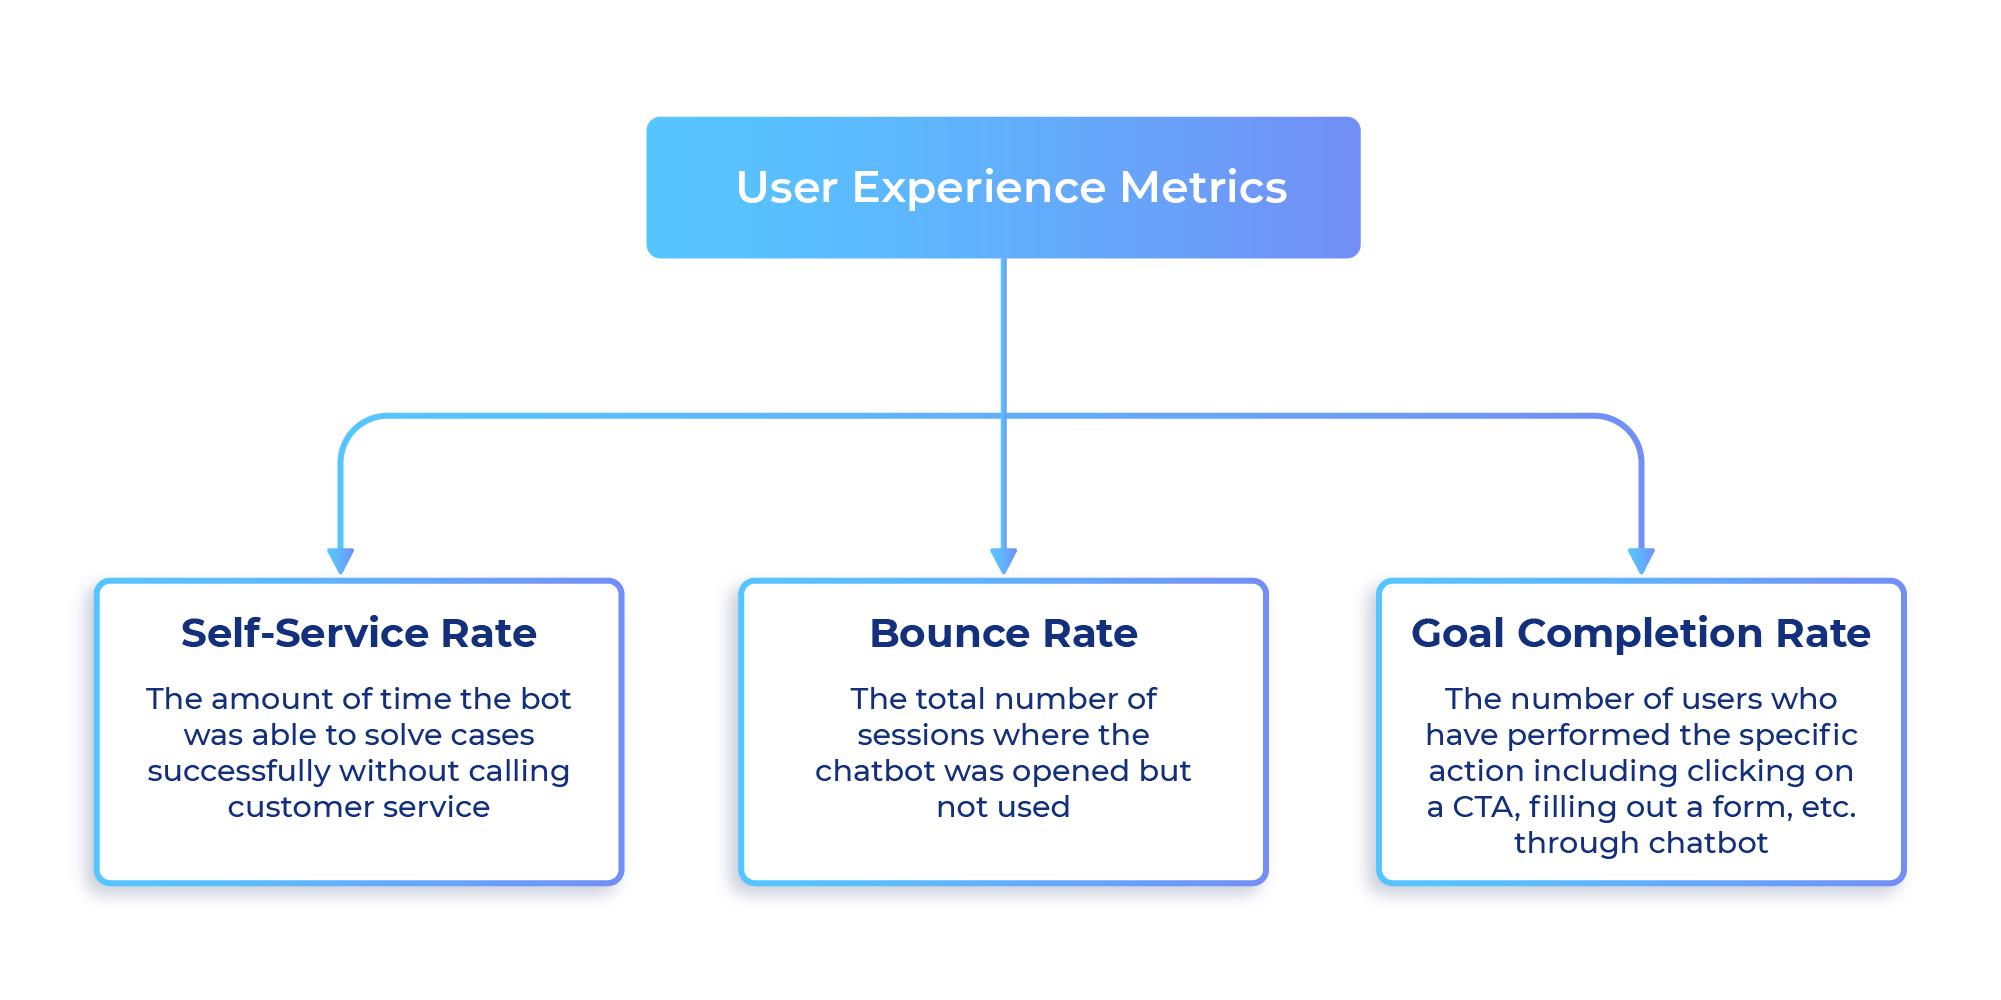 User Experience Metrics